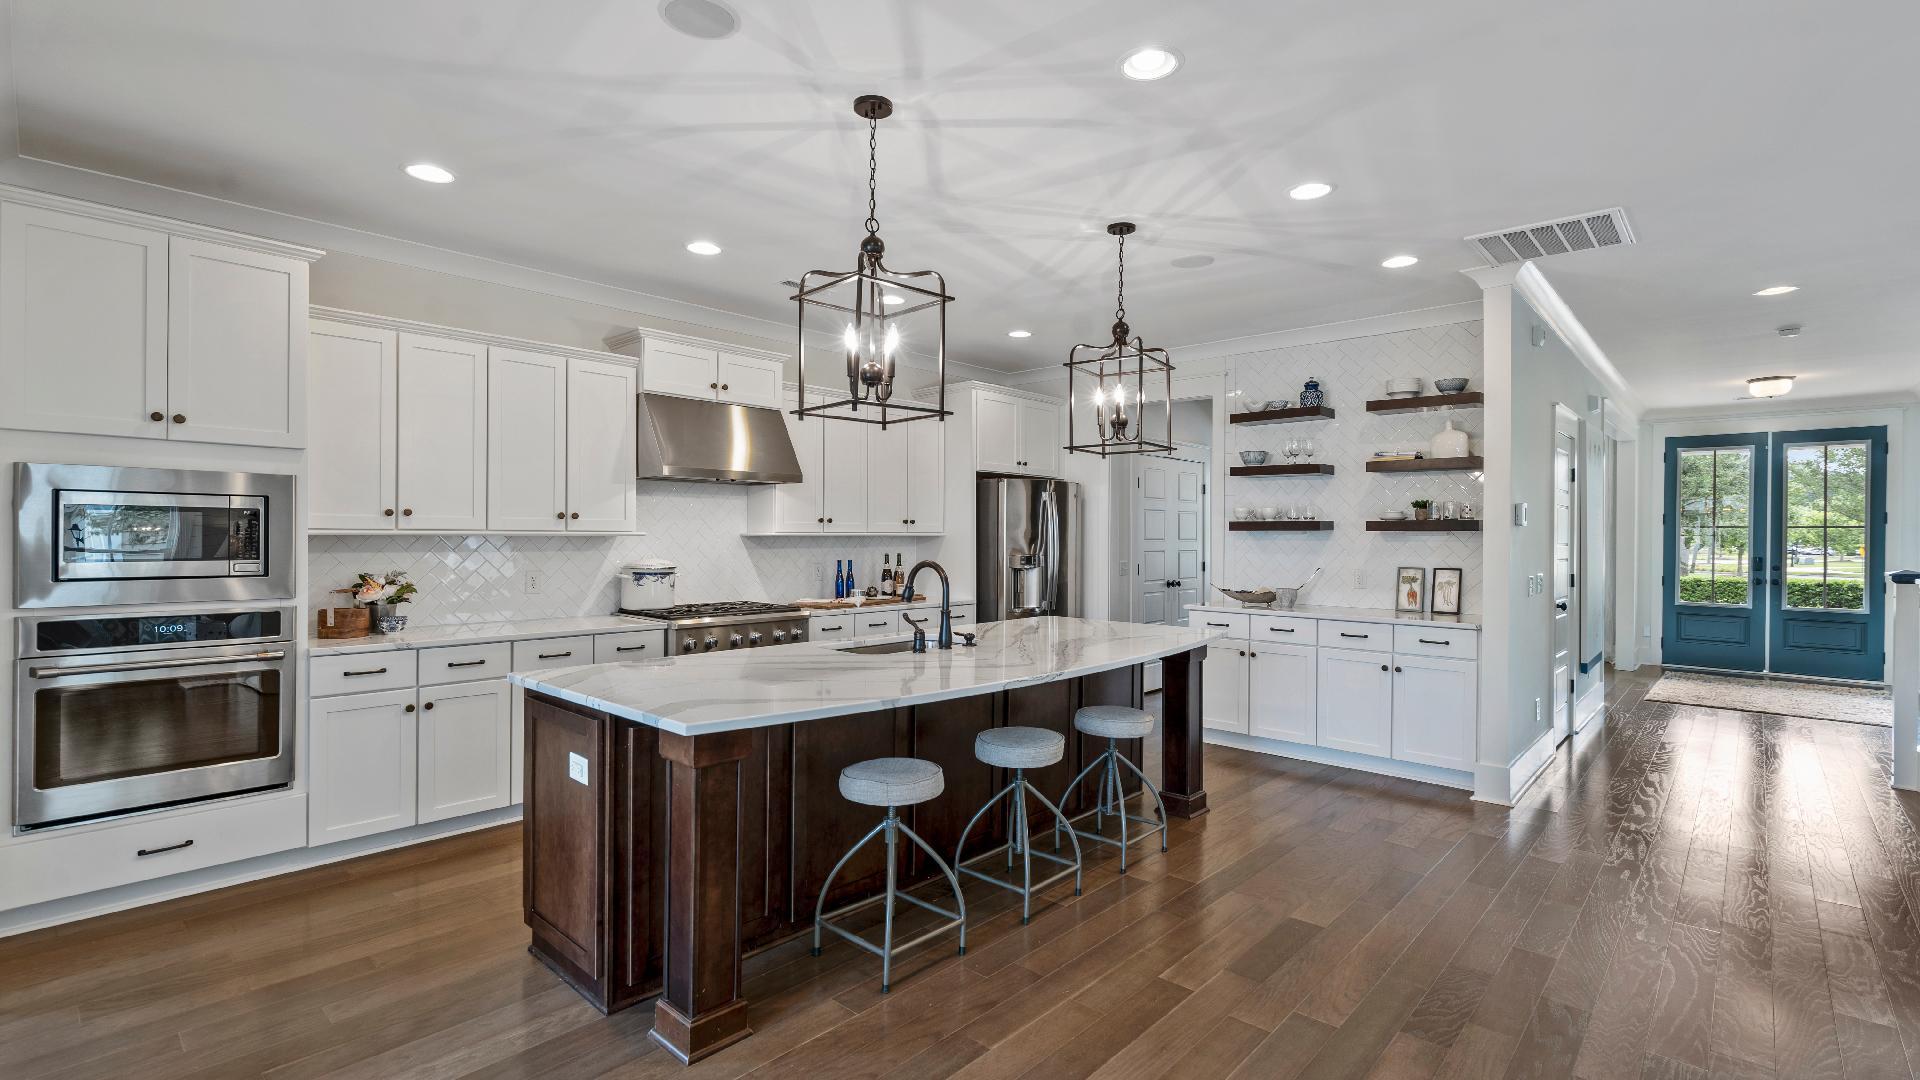 Radcliffe model home kitchen